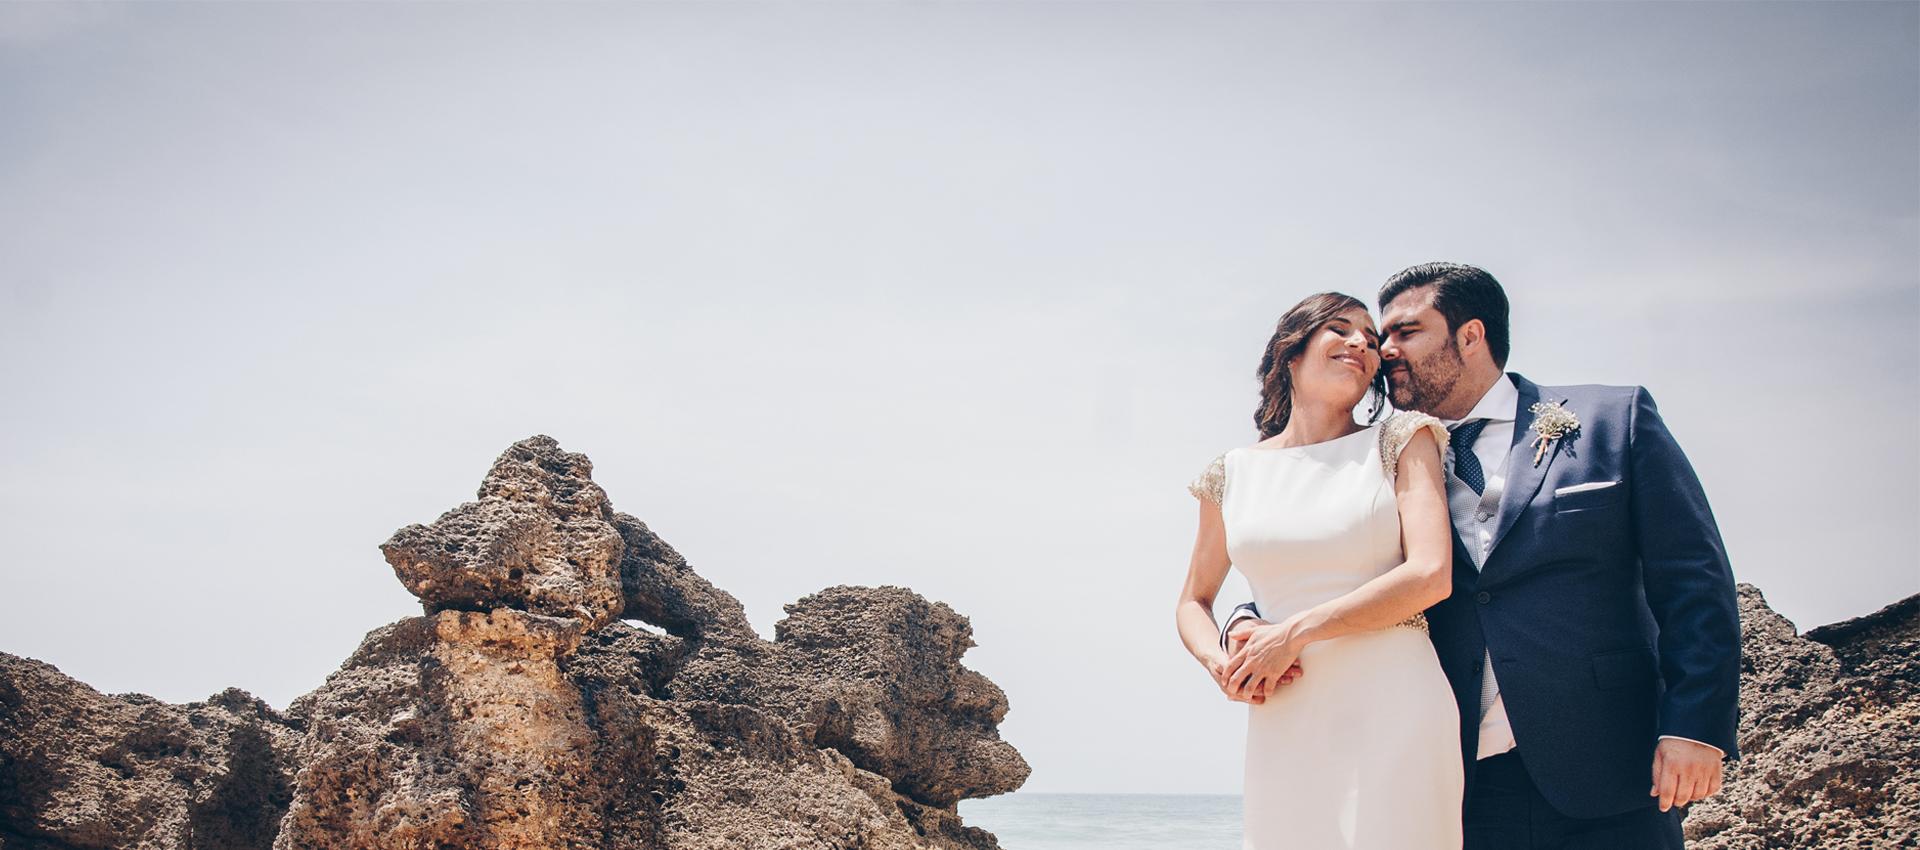 Gema-PacoPortada Fotografía de Boda - video boda cadiz